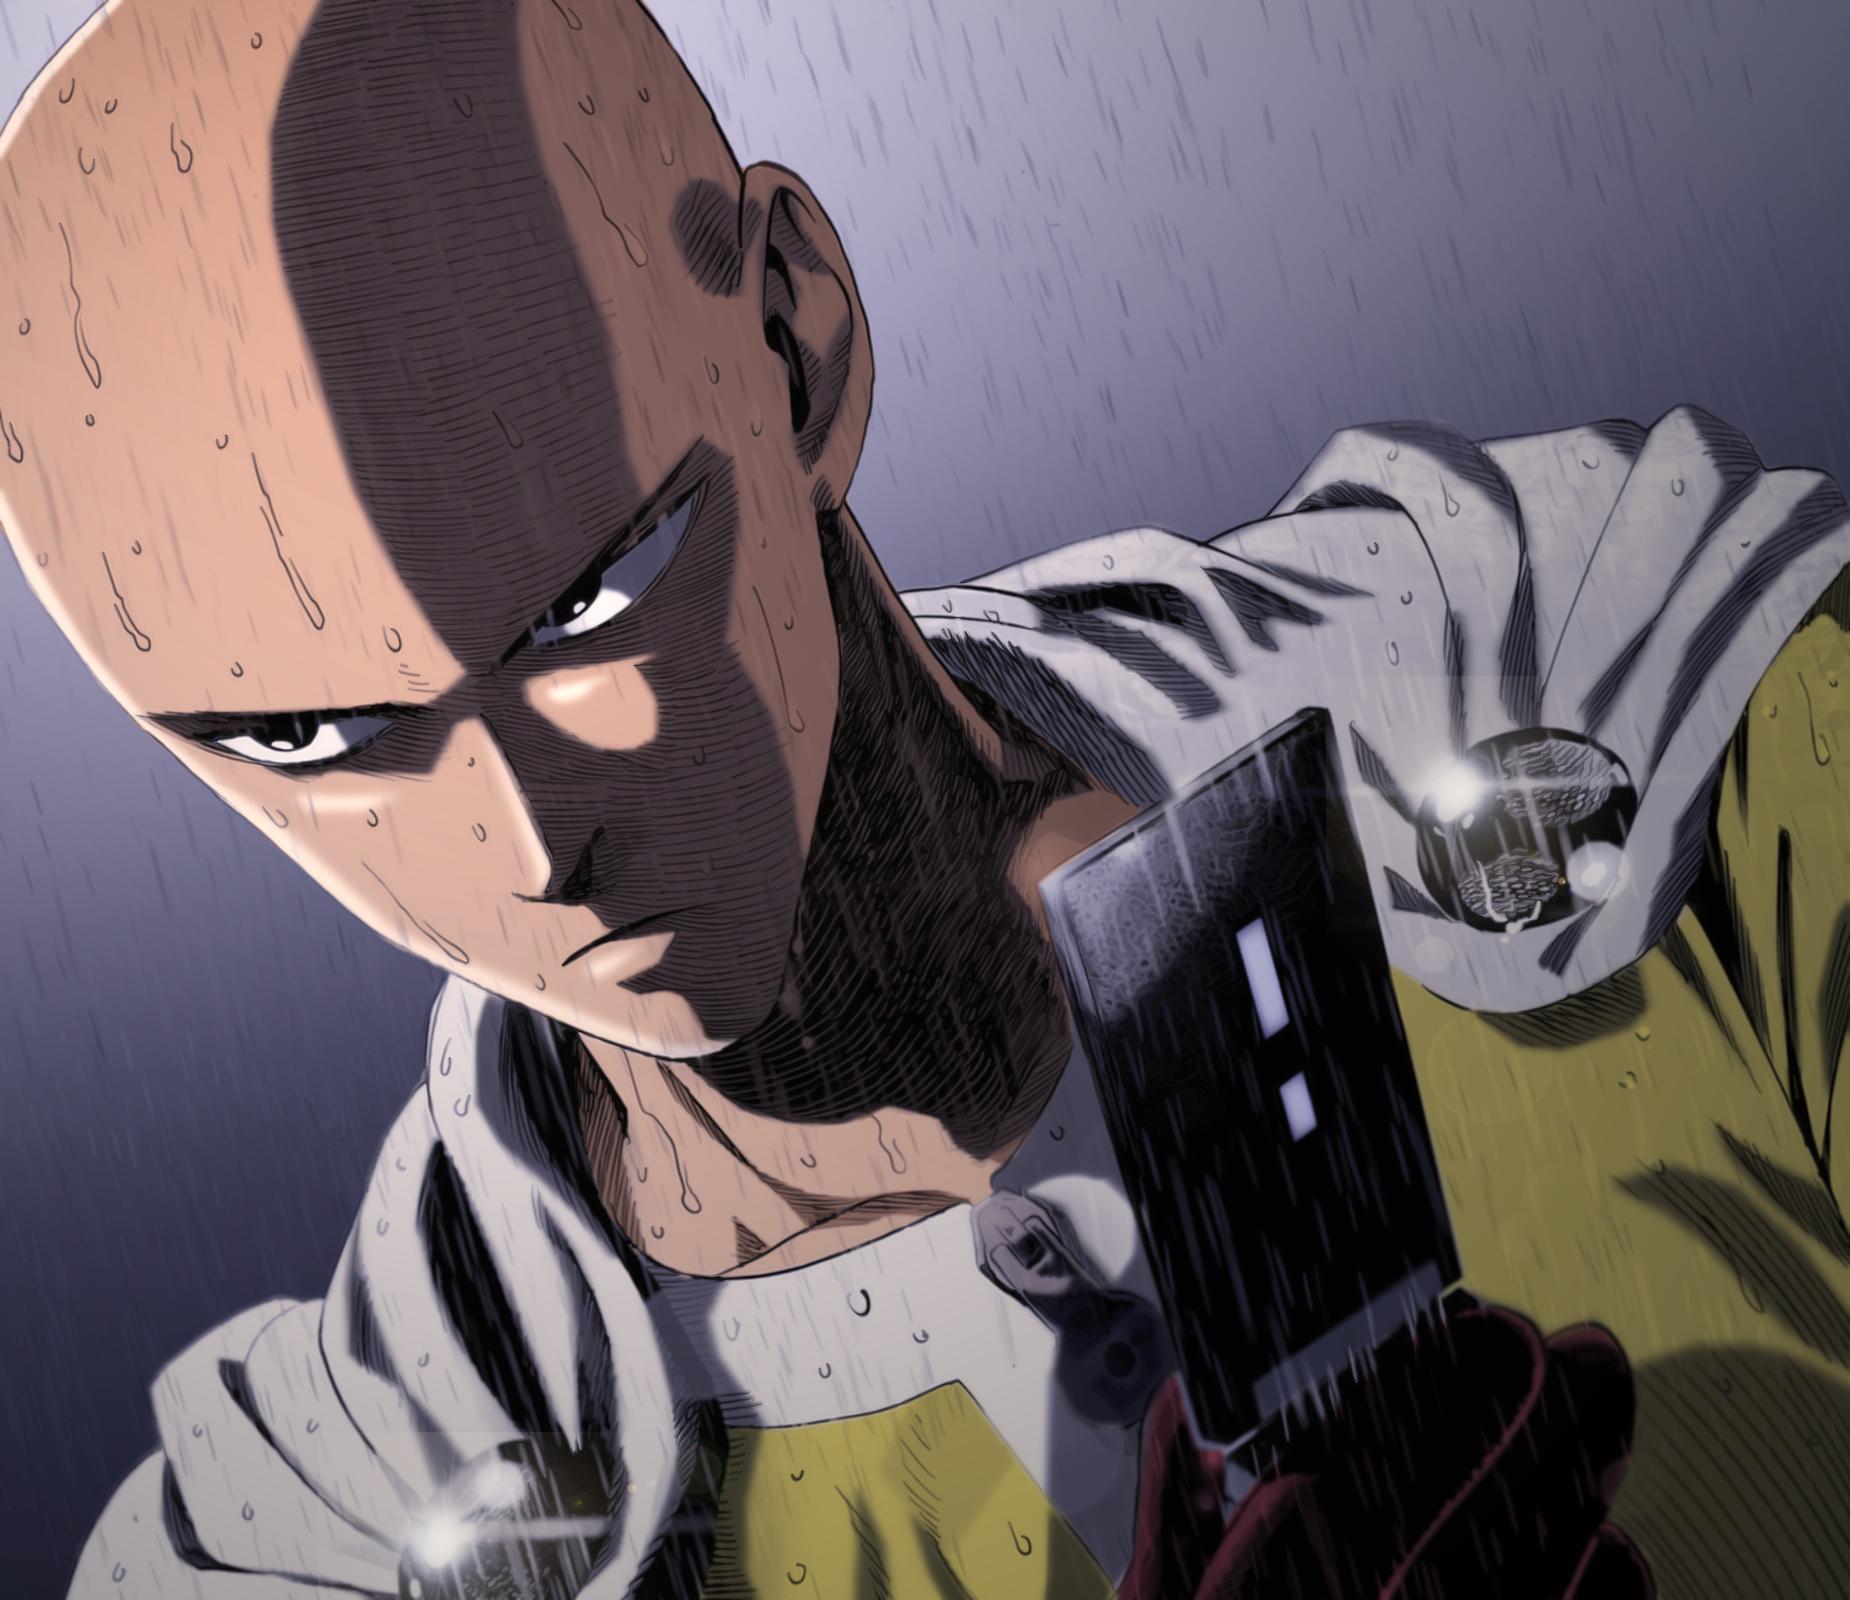 Wallpaper Saitama Serious Anime One Punch Man Hd - doraemon